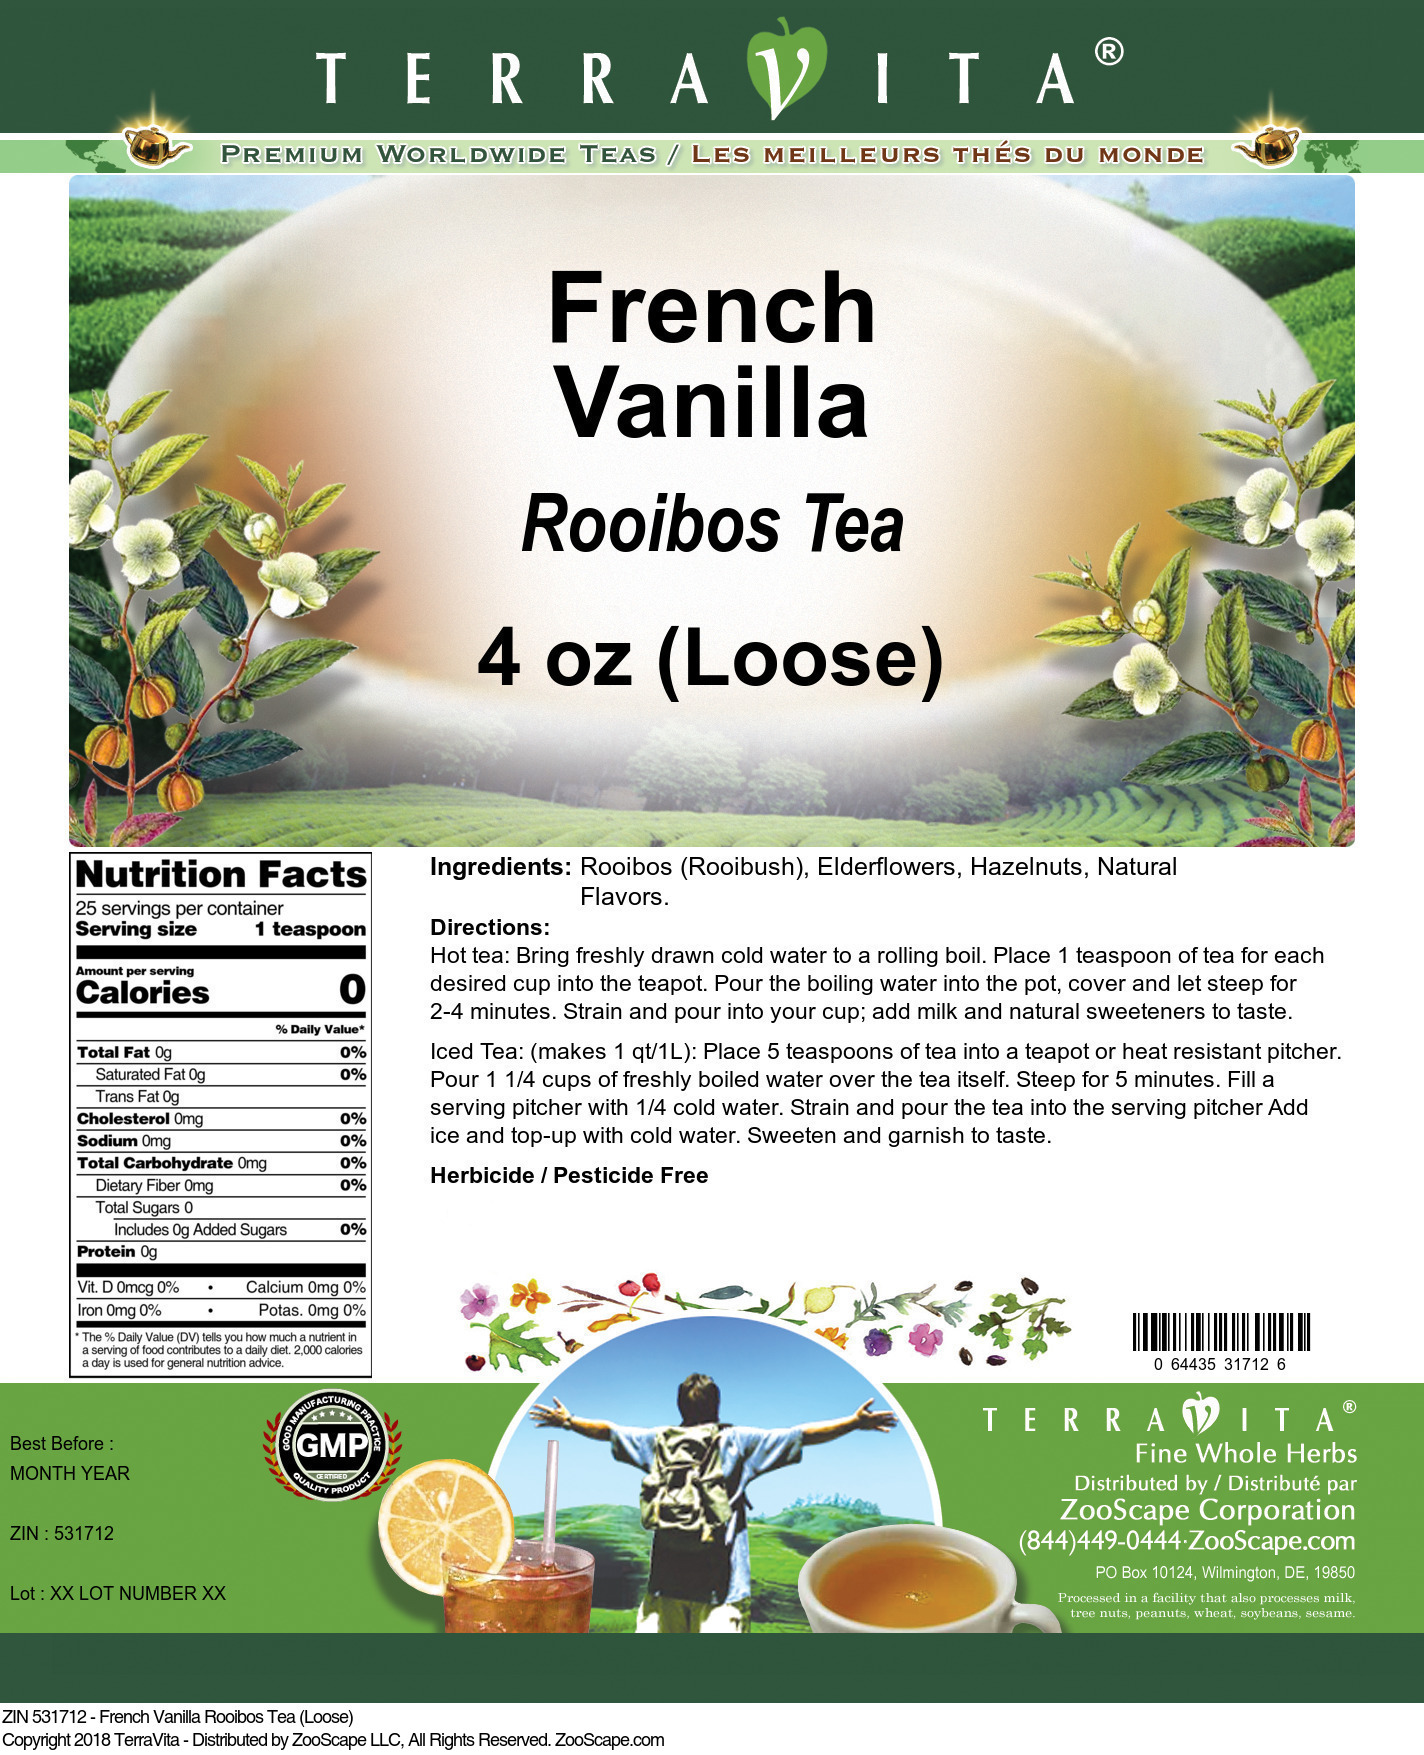 French Vanilla Rooibos Tea (Loose)